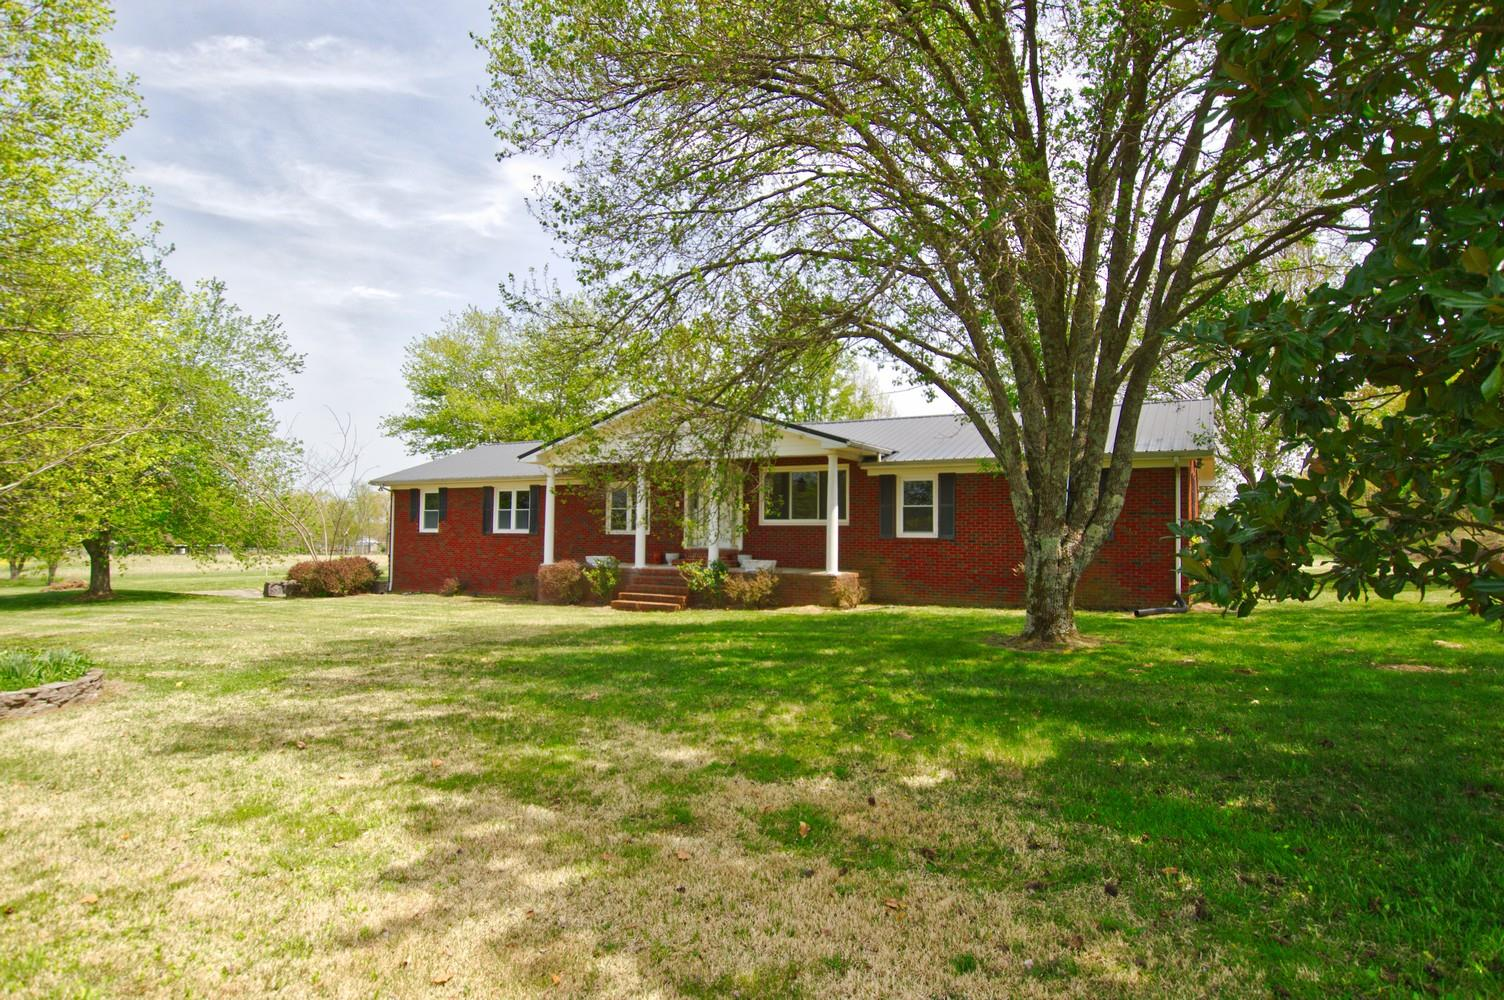 165 Davenport Ln, Bradyville, TN 37026 - Bradyville, TN real estate listing